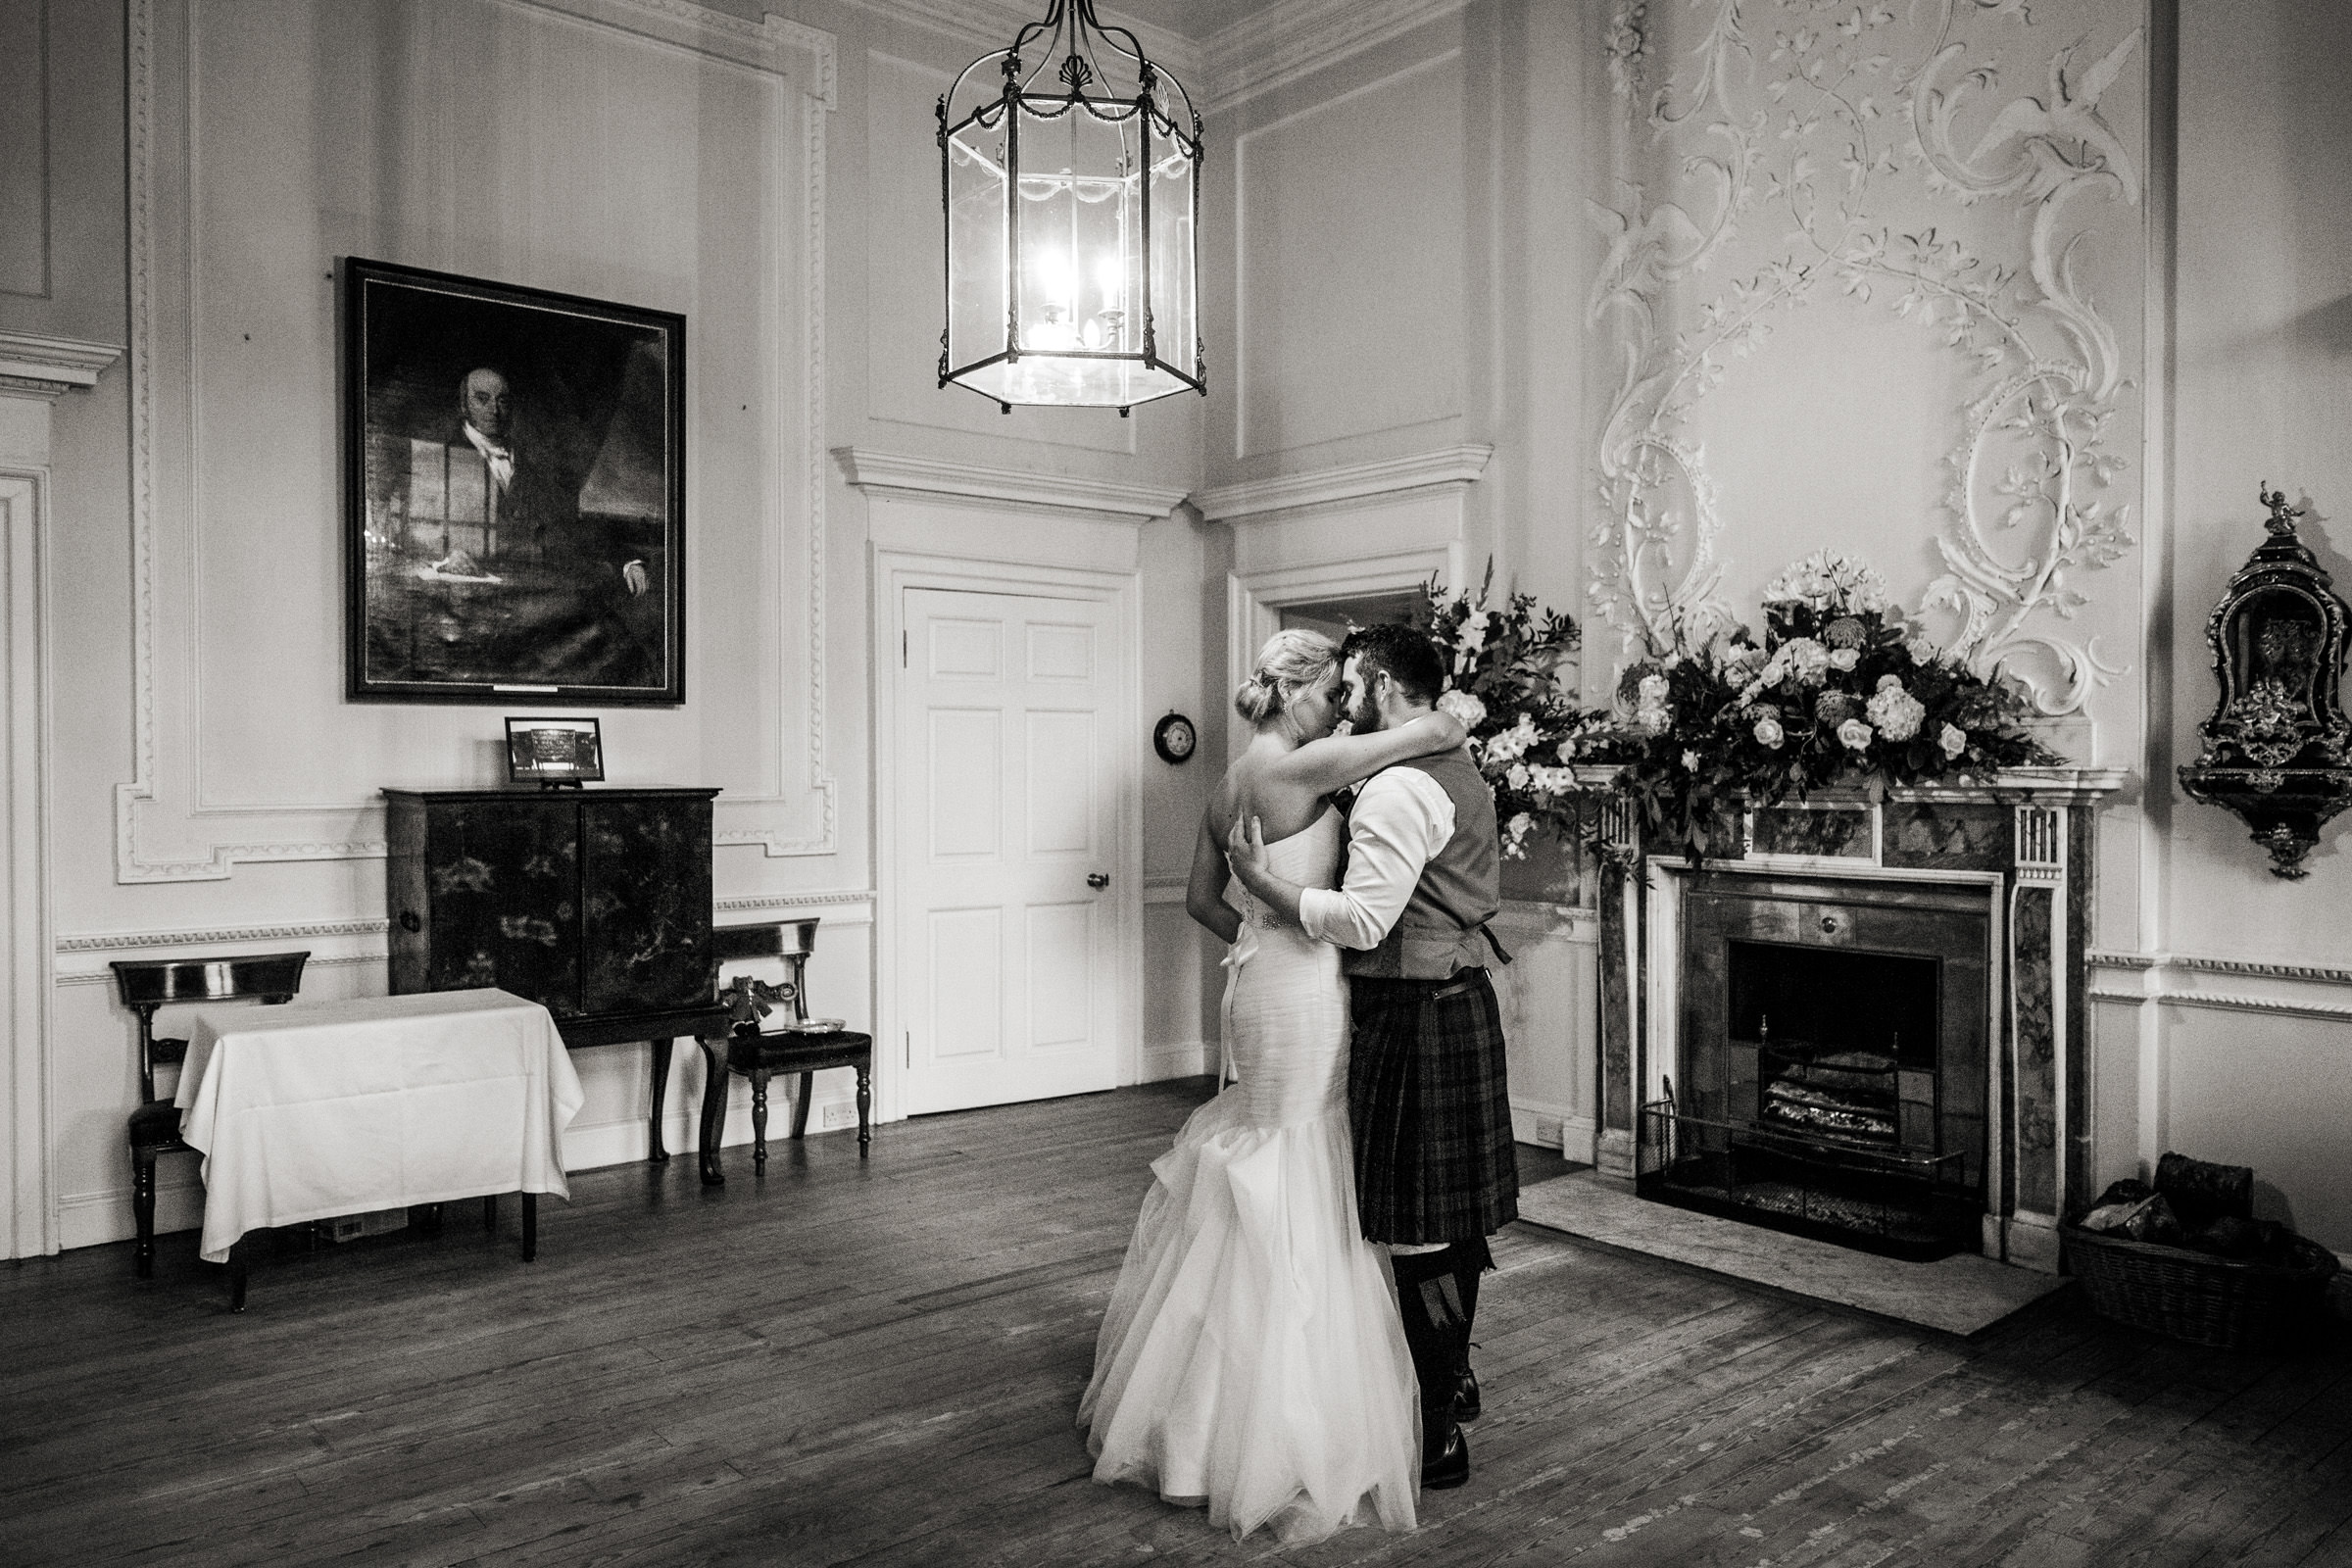 Documentart wedding photographers Berwick-upon-Tweed 030.jpg